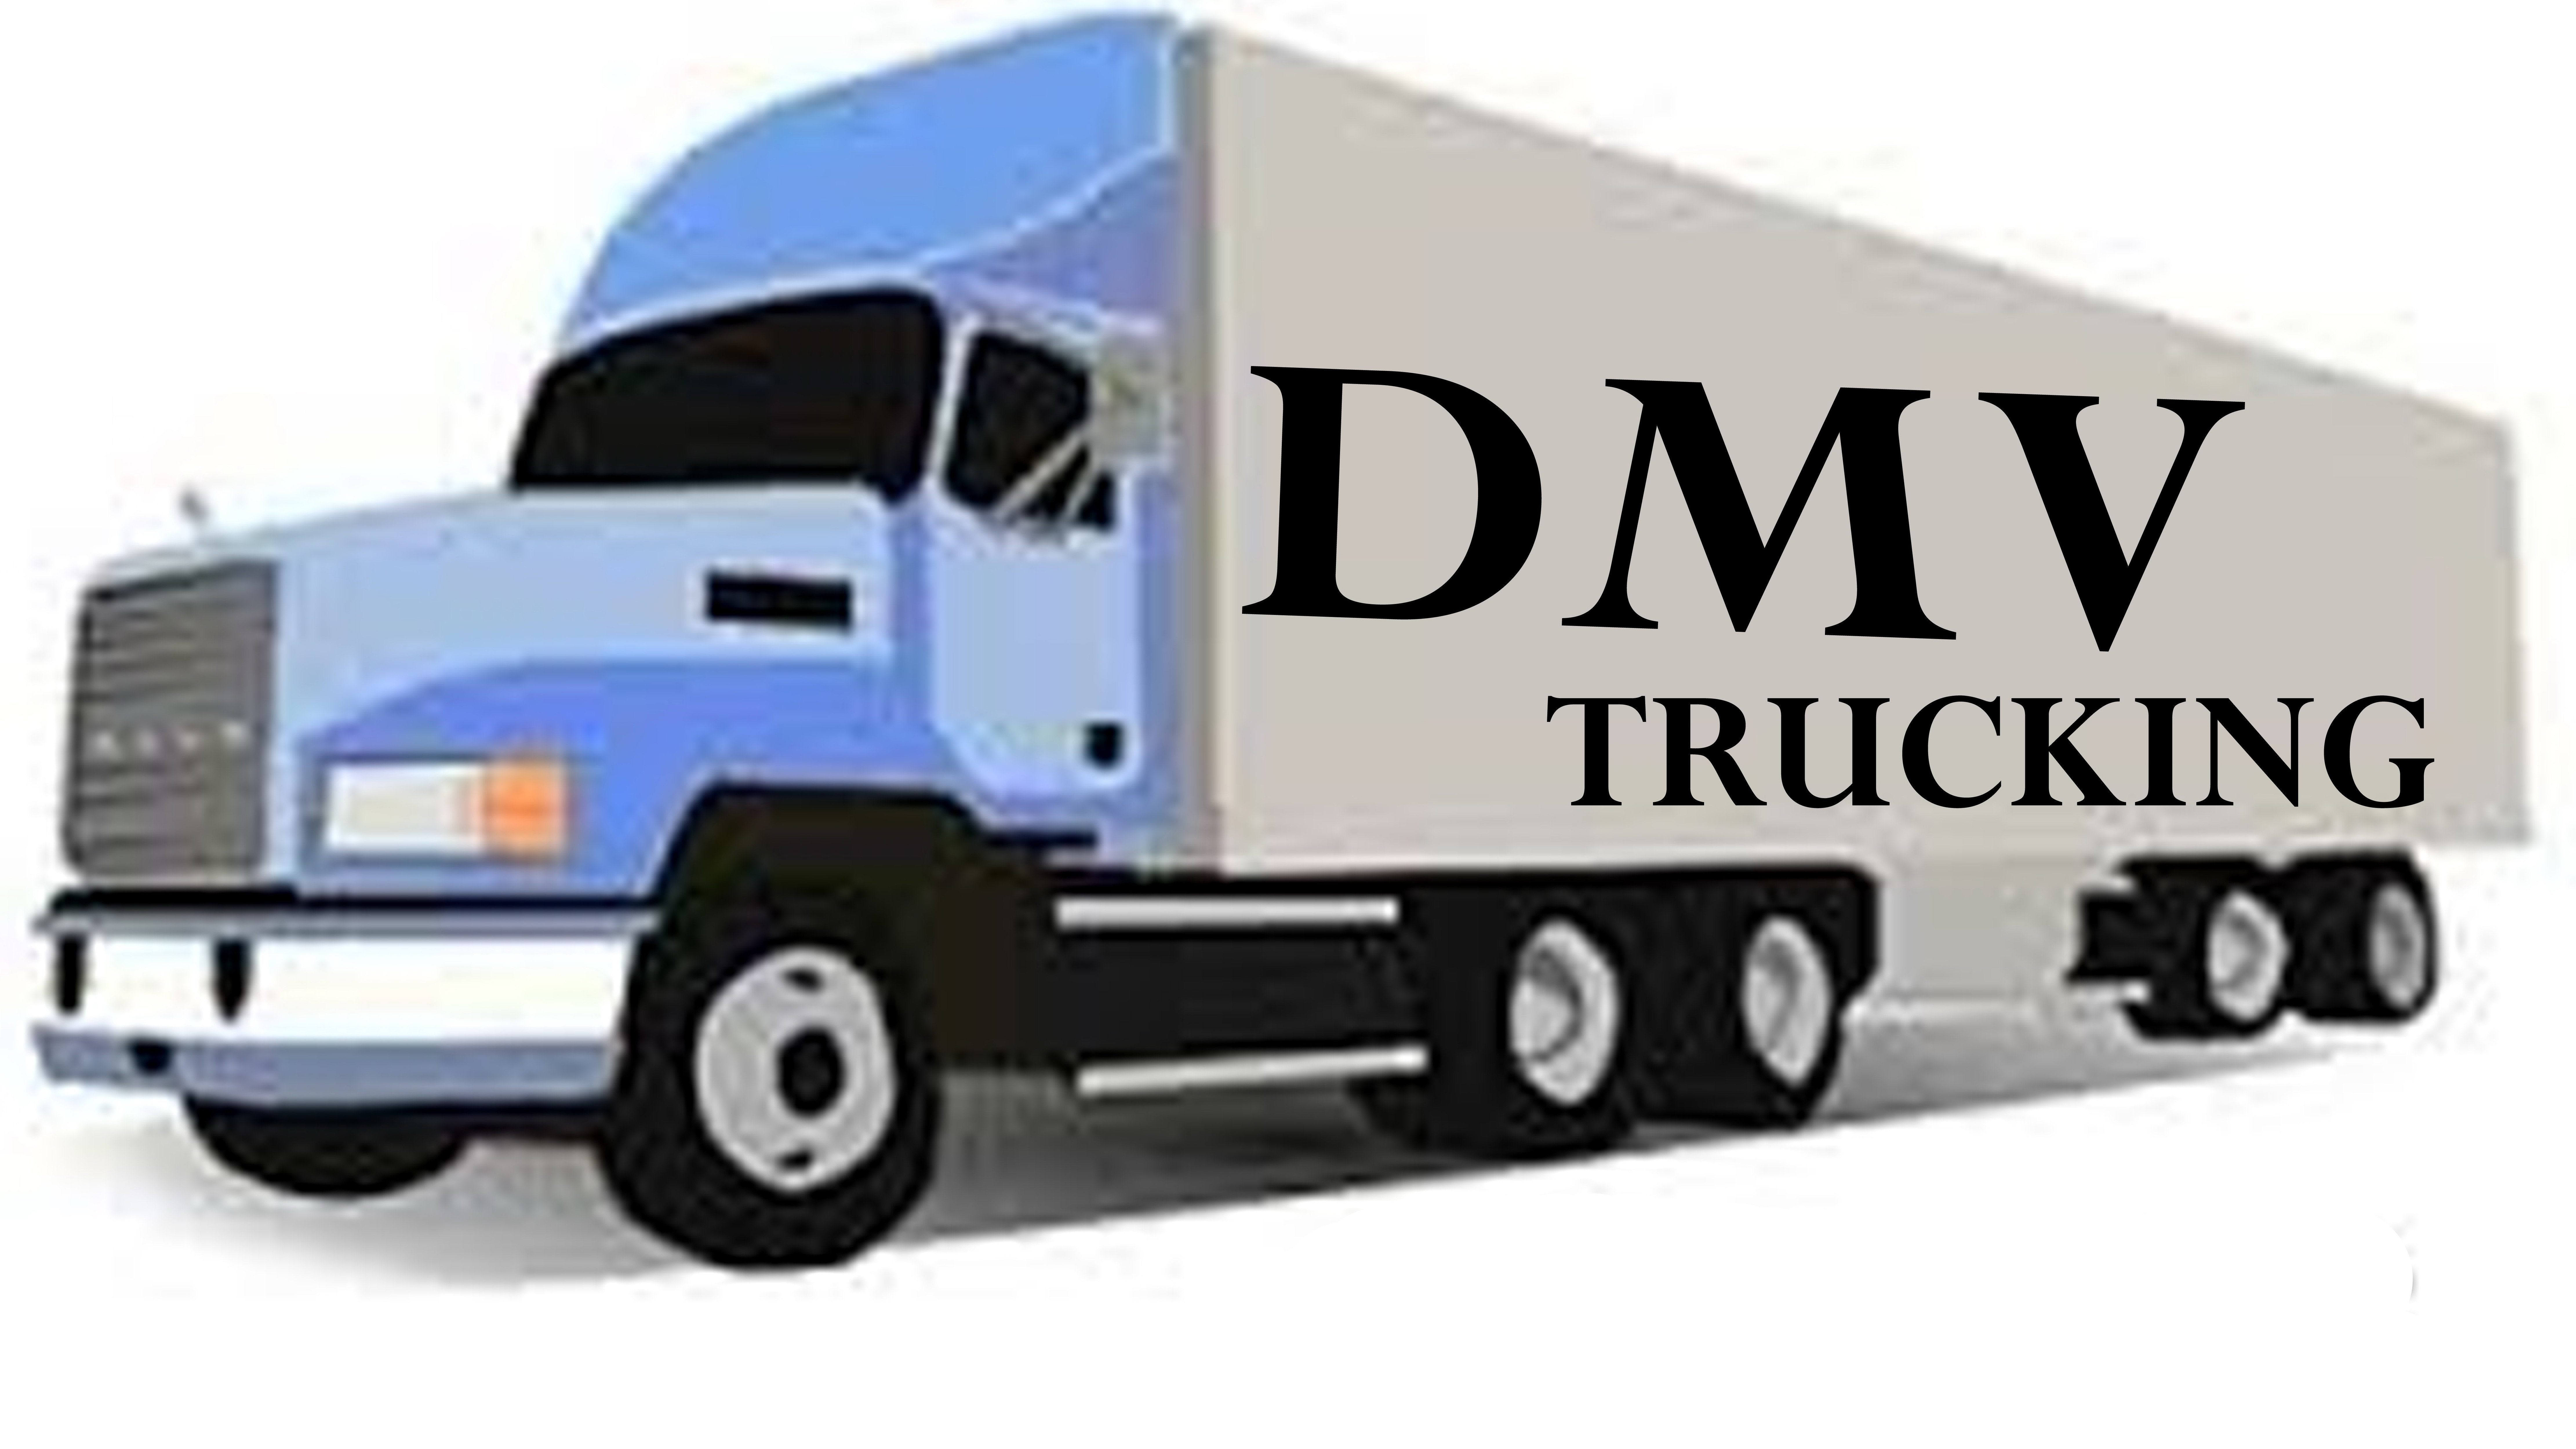 DMV trucking